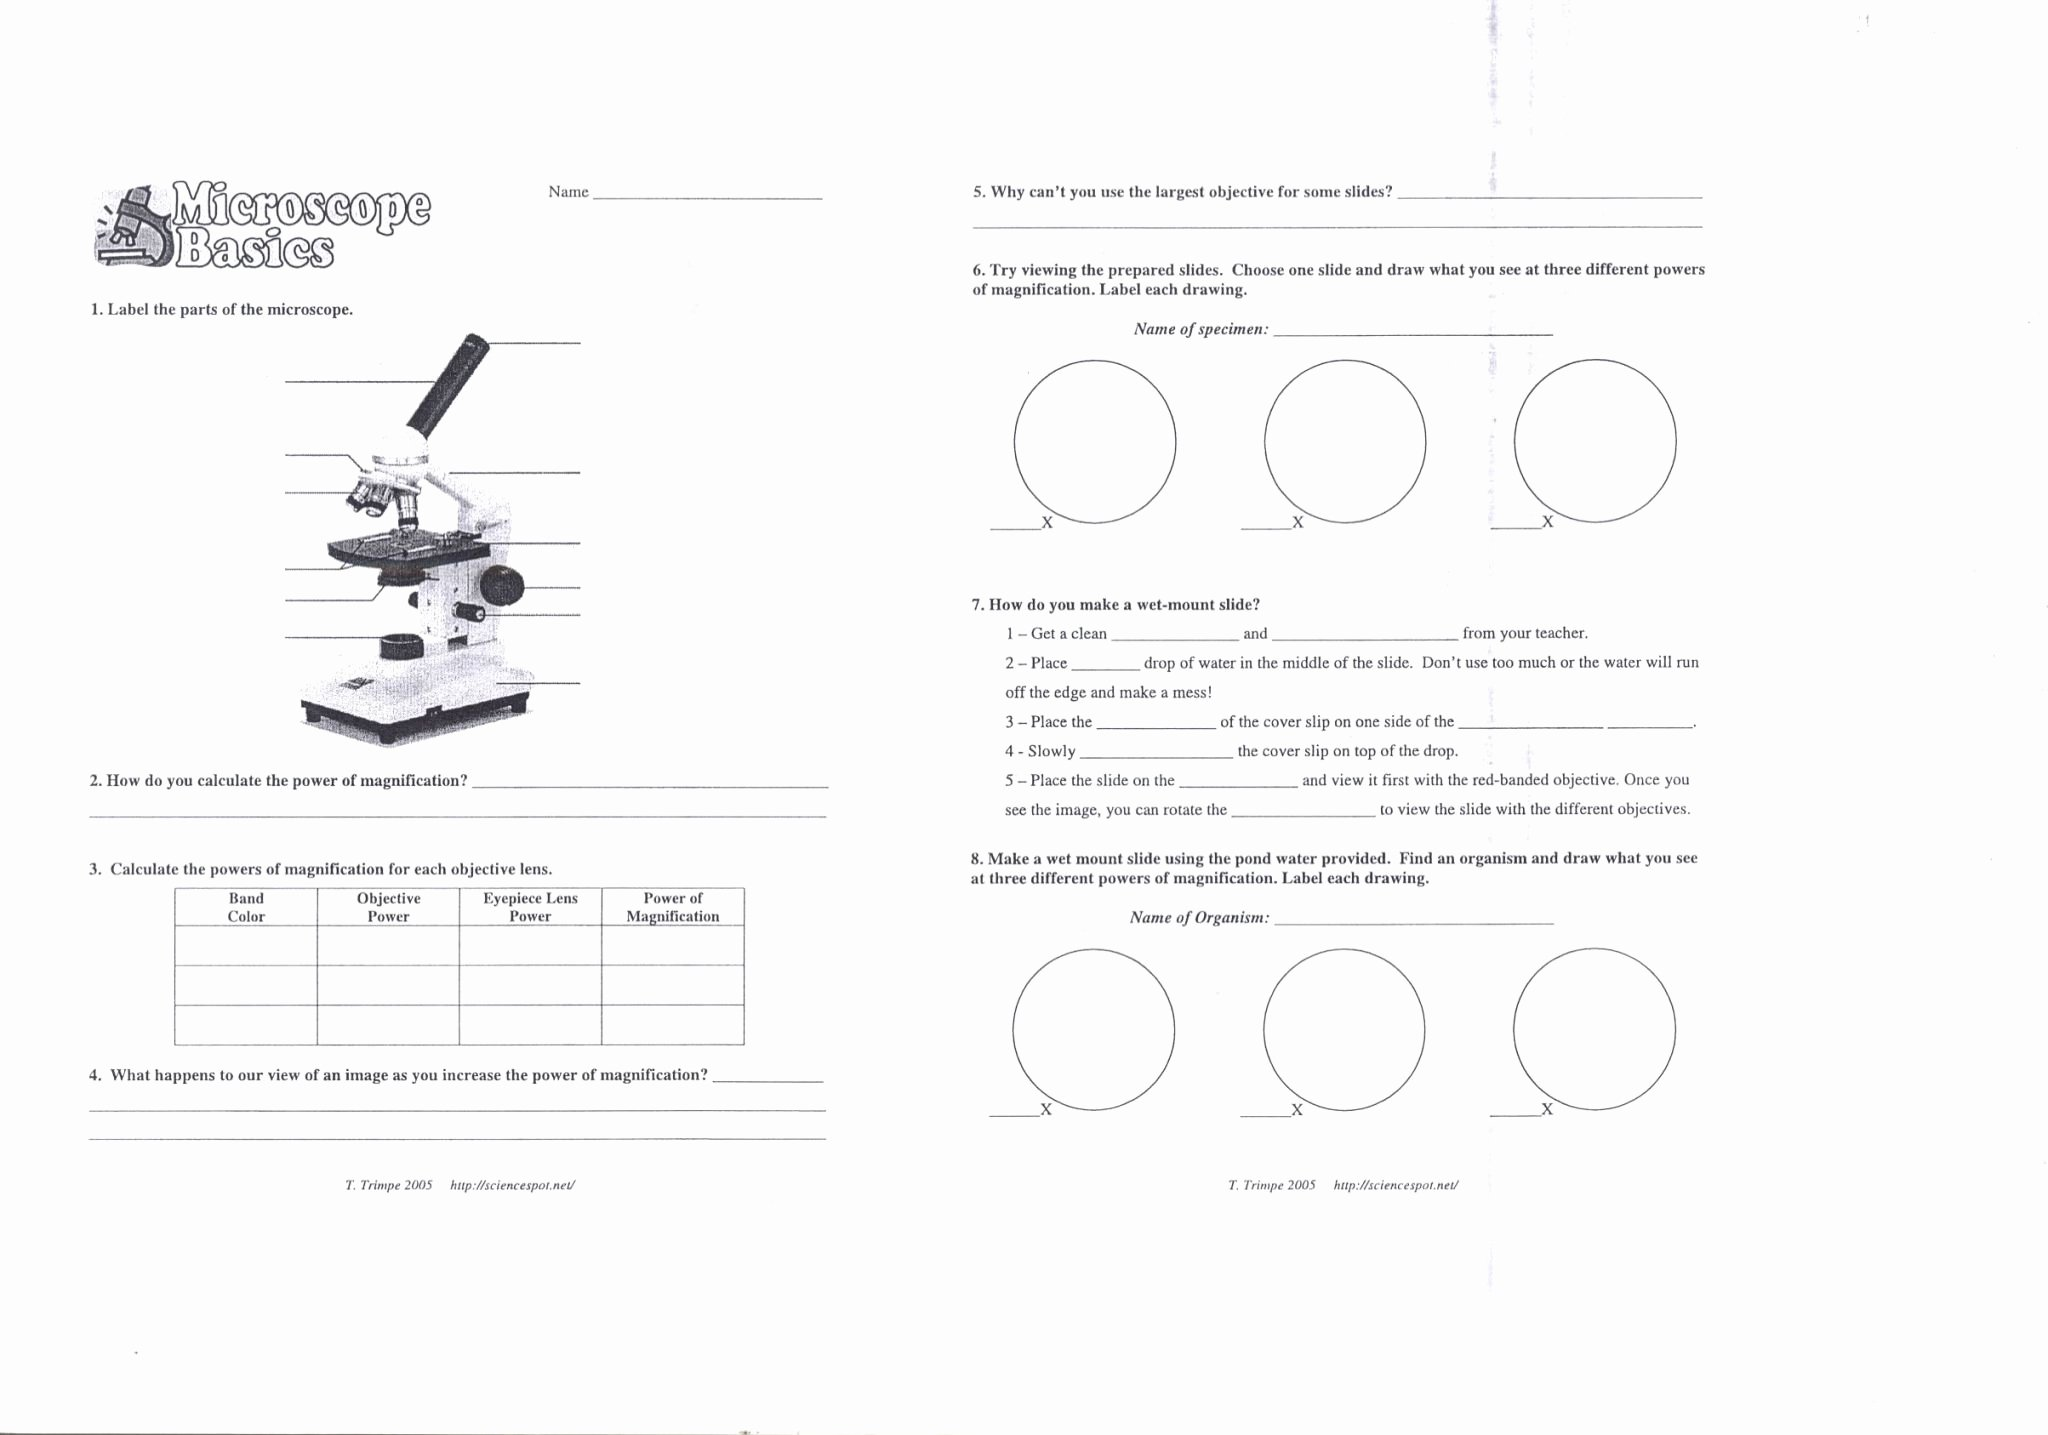 Microscope Parts and Use Worksheet Elegant Using A Microscope Worksheet